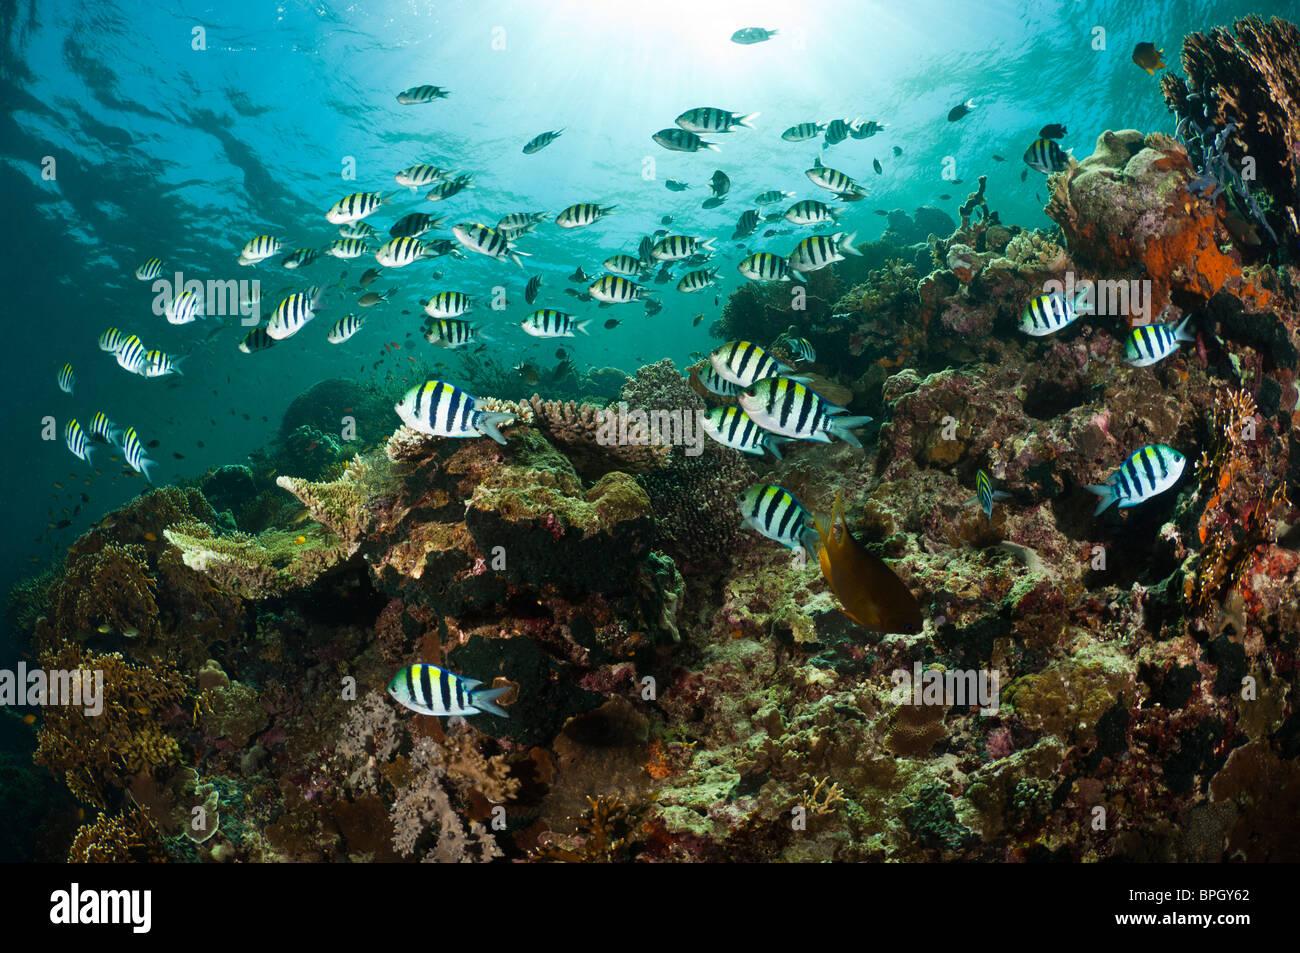 Sergeant major damselfish schooling above a reef, Menjangan, Bali, Indonesia. - Stock Image